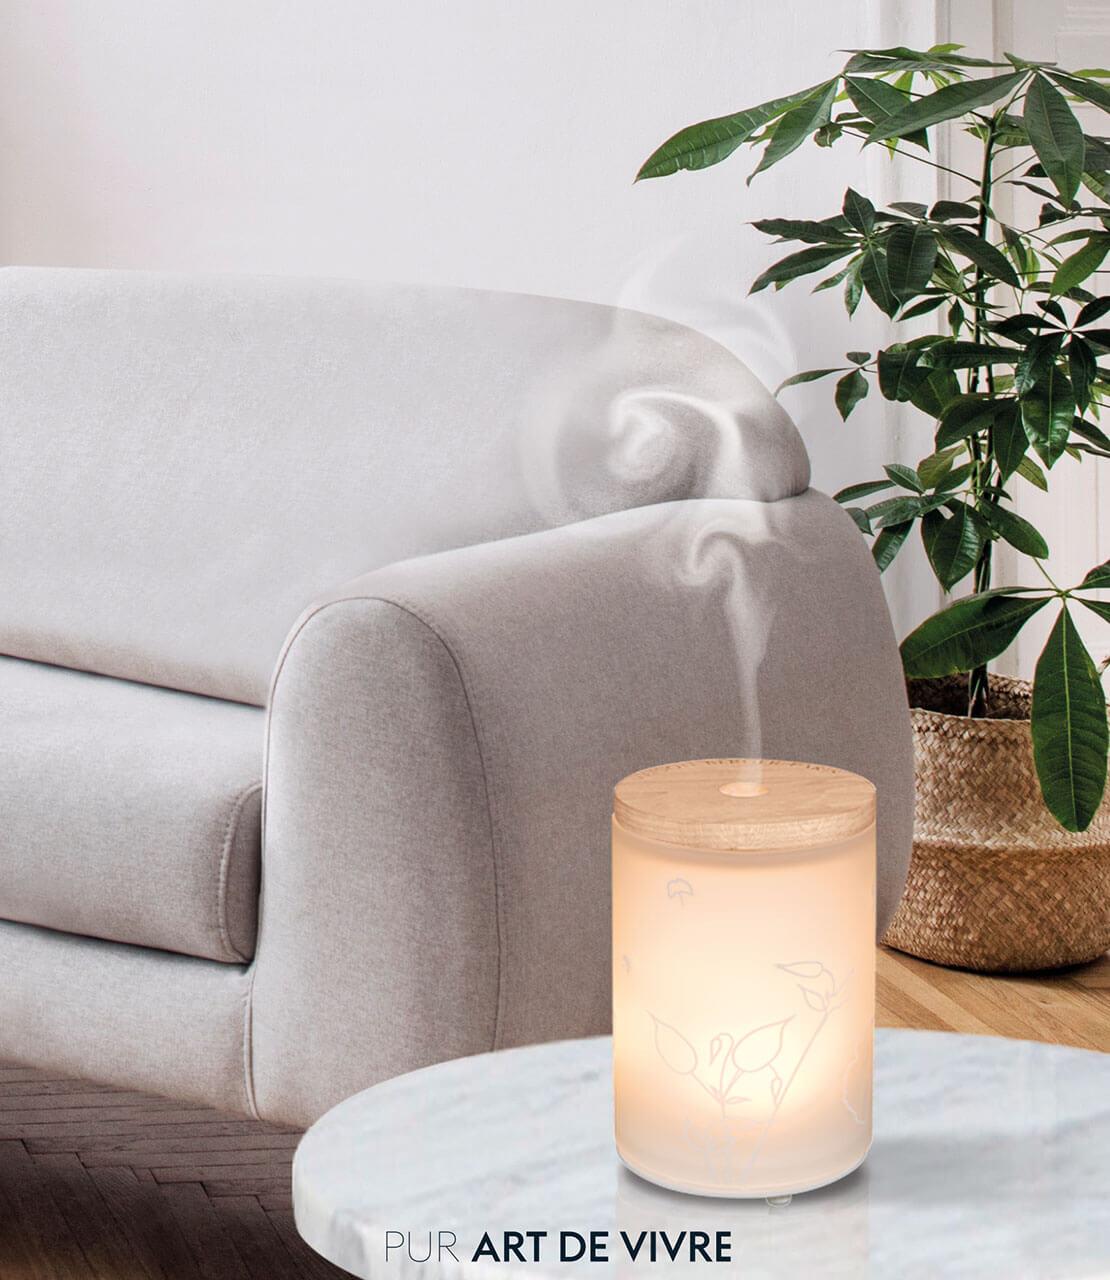 MAISON BERGER PARIS - die exklusive Duftlampe | Möbel Schulze